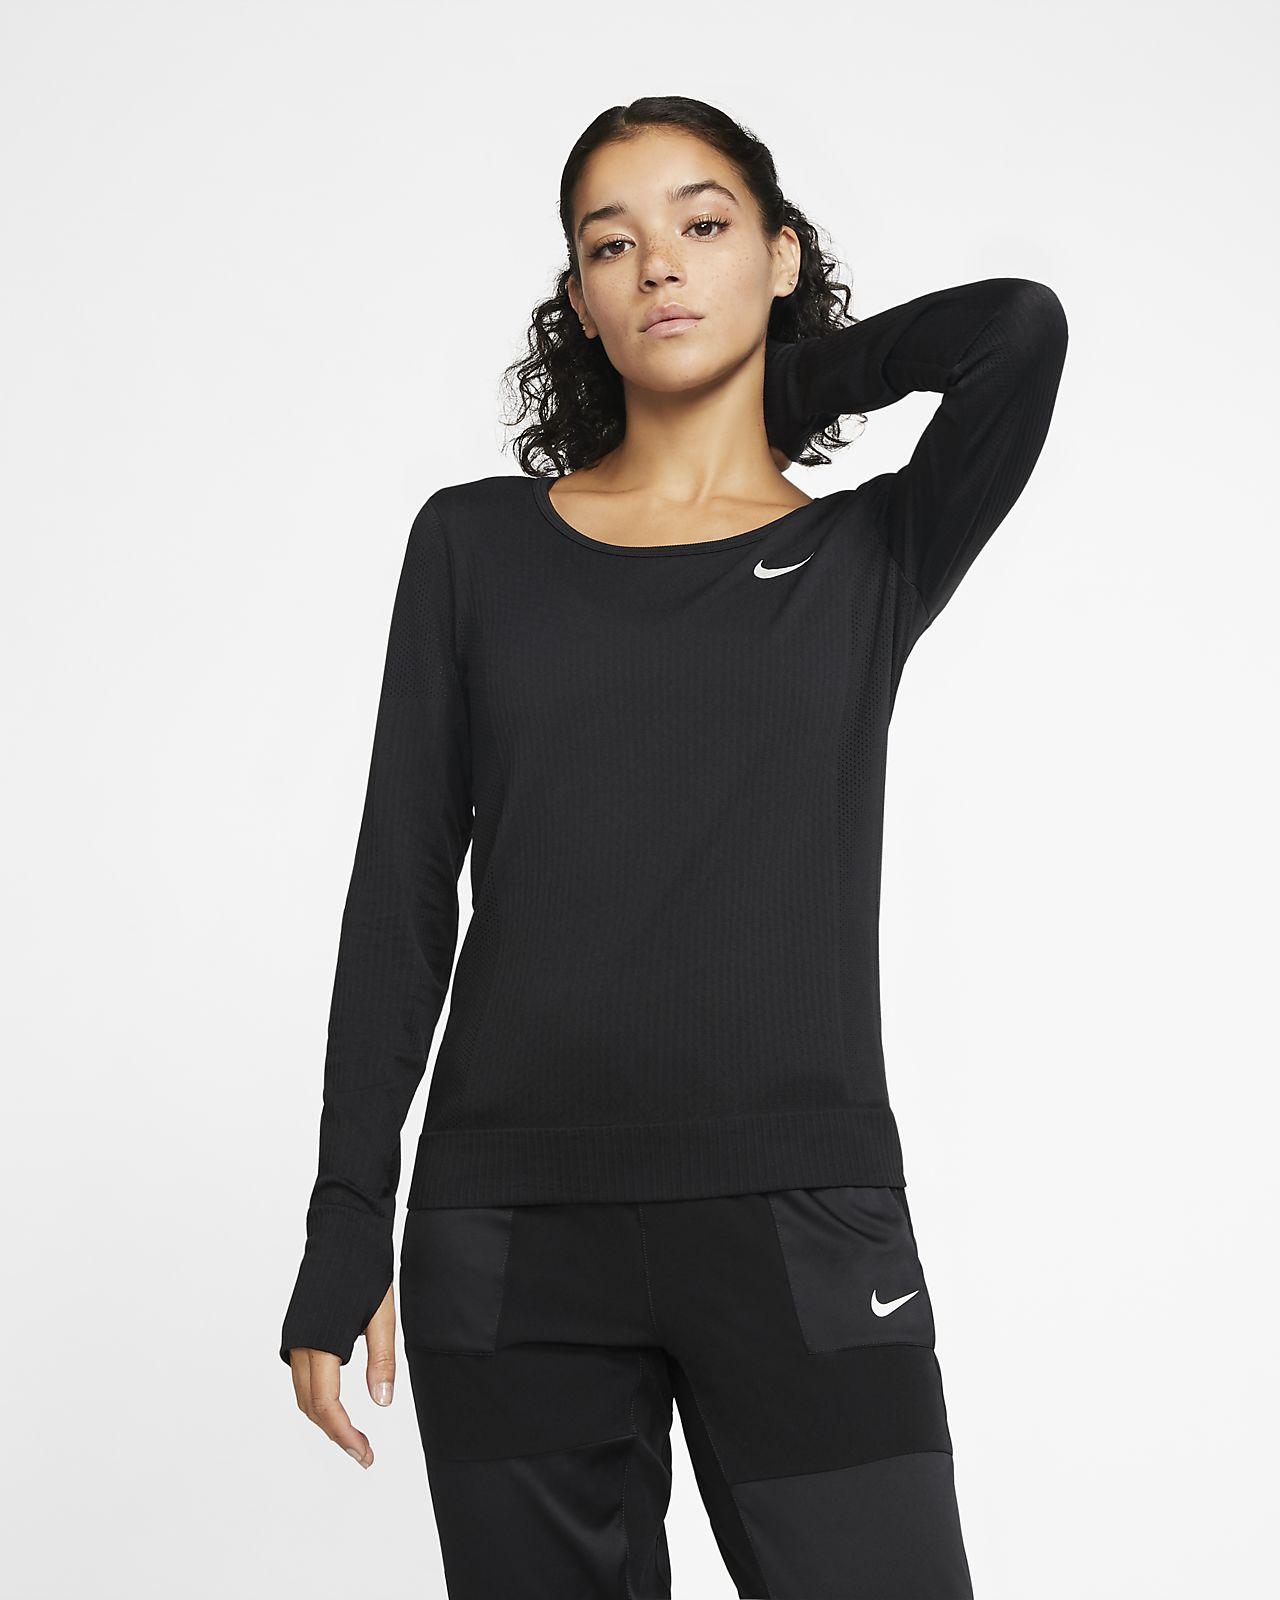 Camisola de running de manga comprida Nike Infinite para mulher